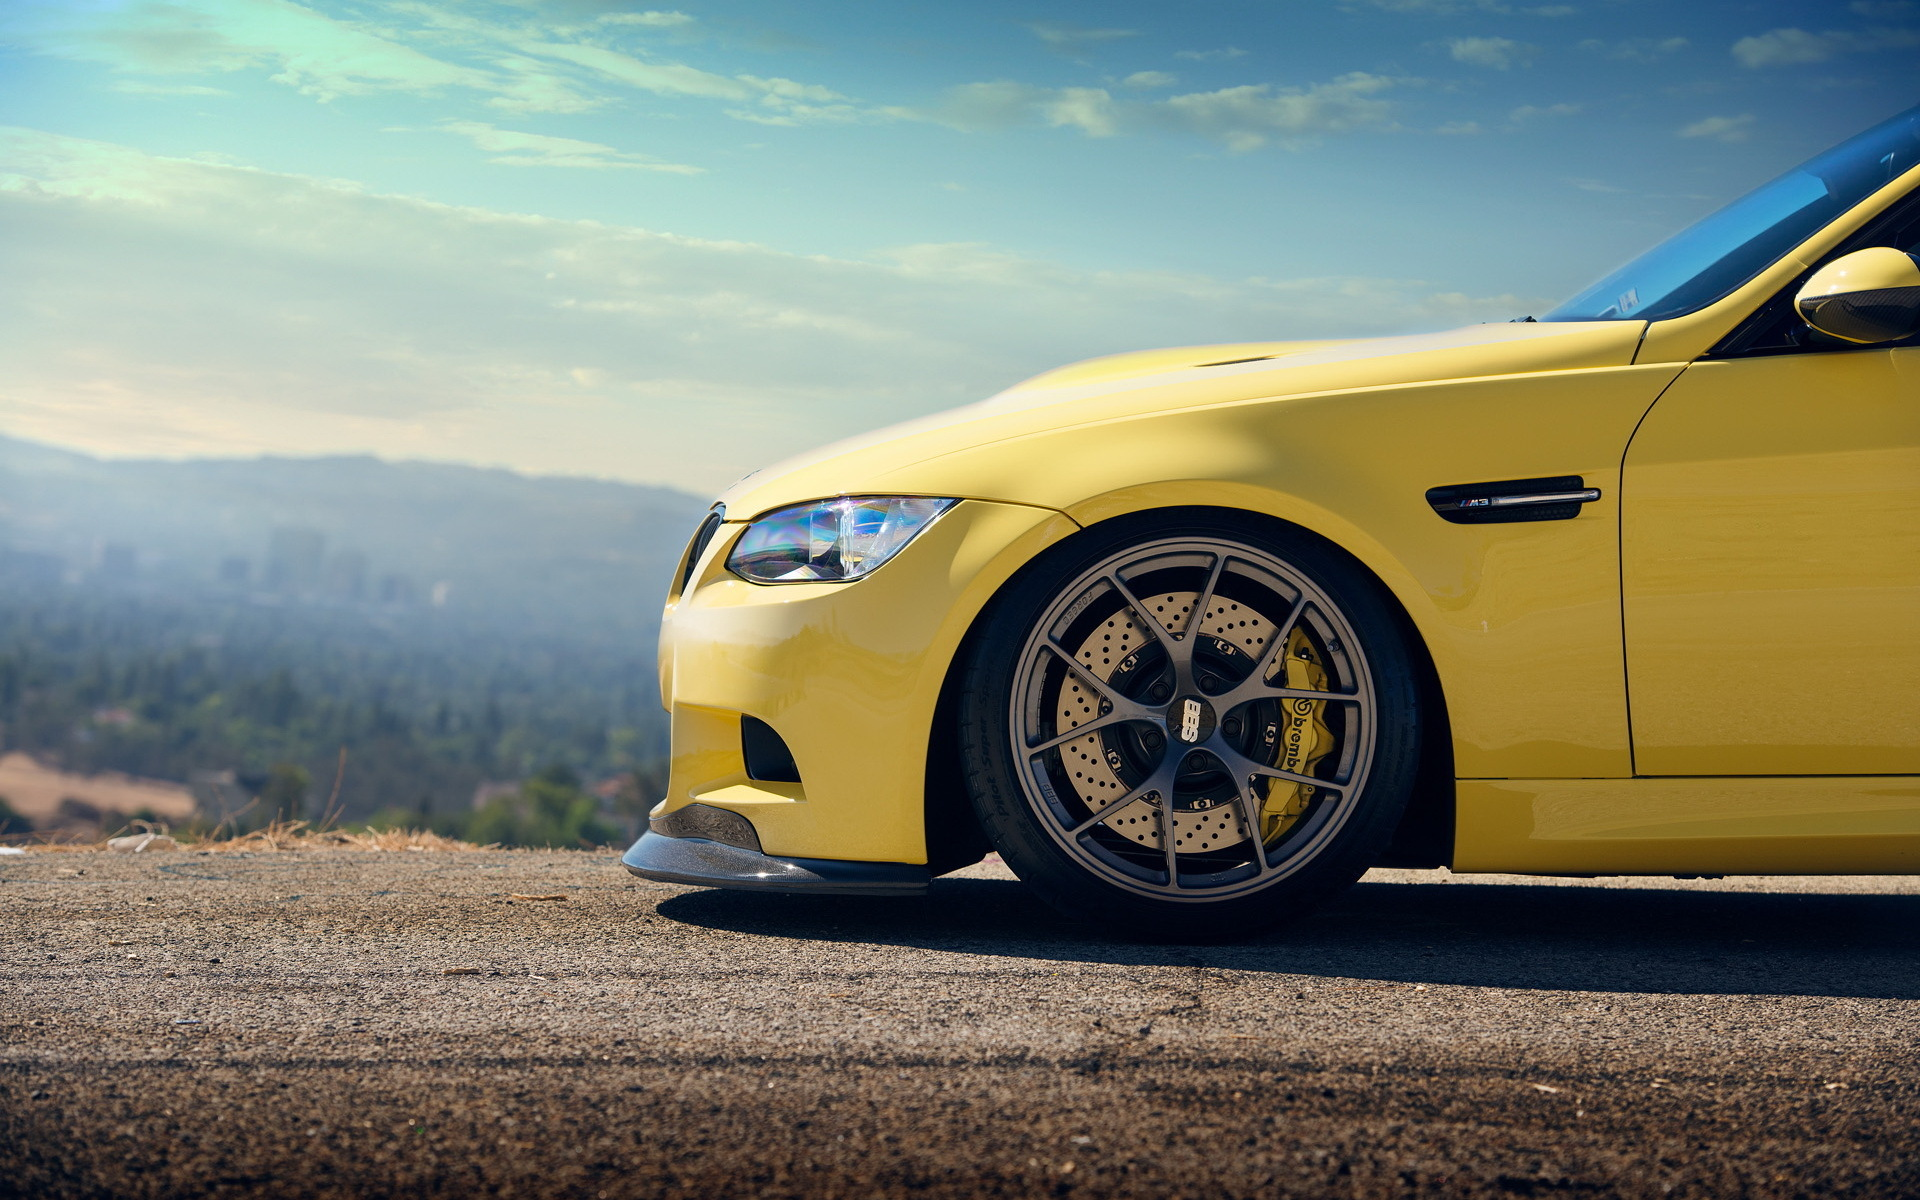 BMW M3 Желтое  № 844730 бесплатно